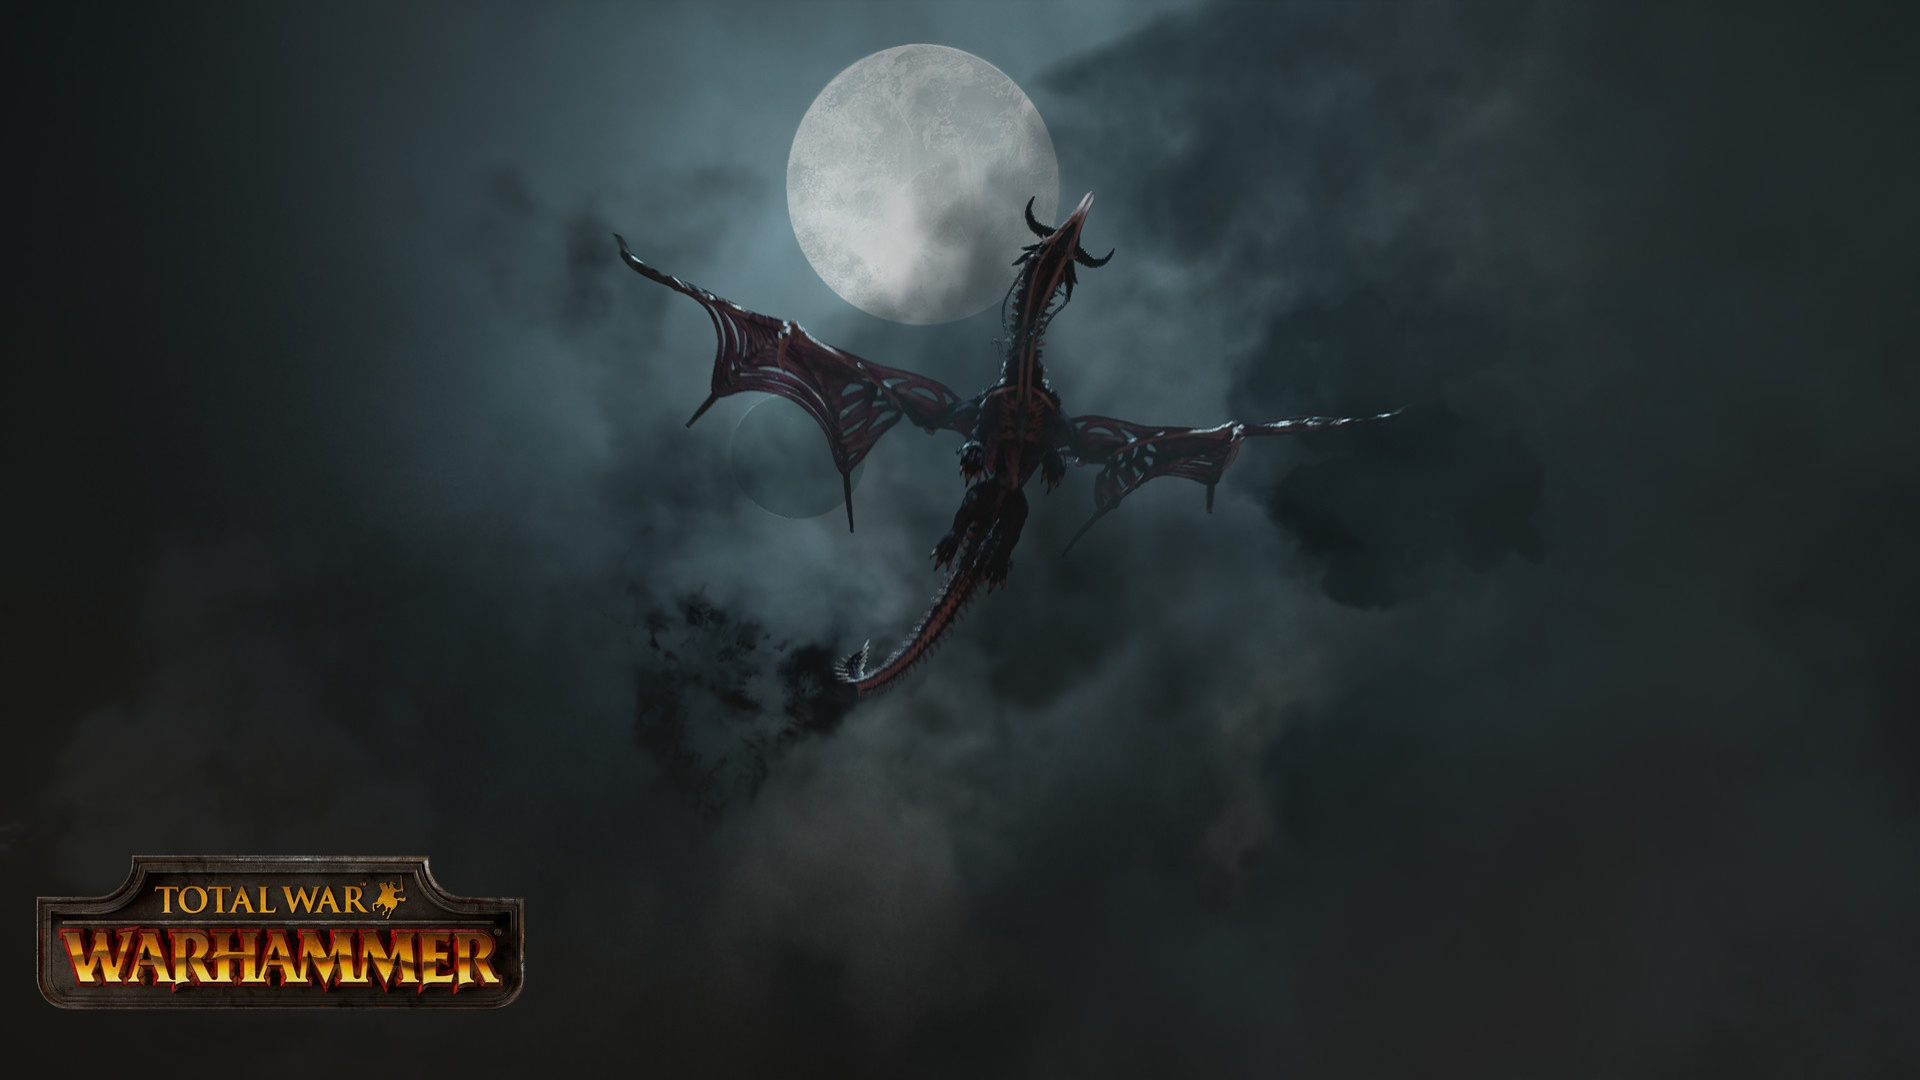 1600x900 Dragon In Total War Warhammer 1600x900 Resolution Hd 4k